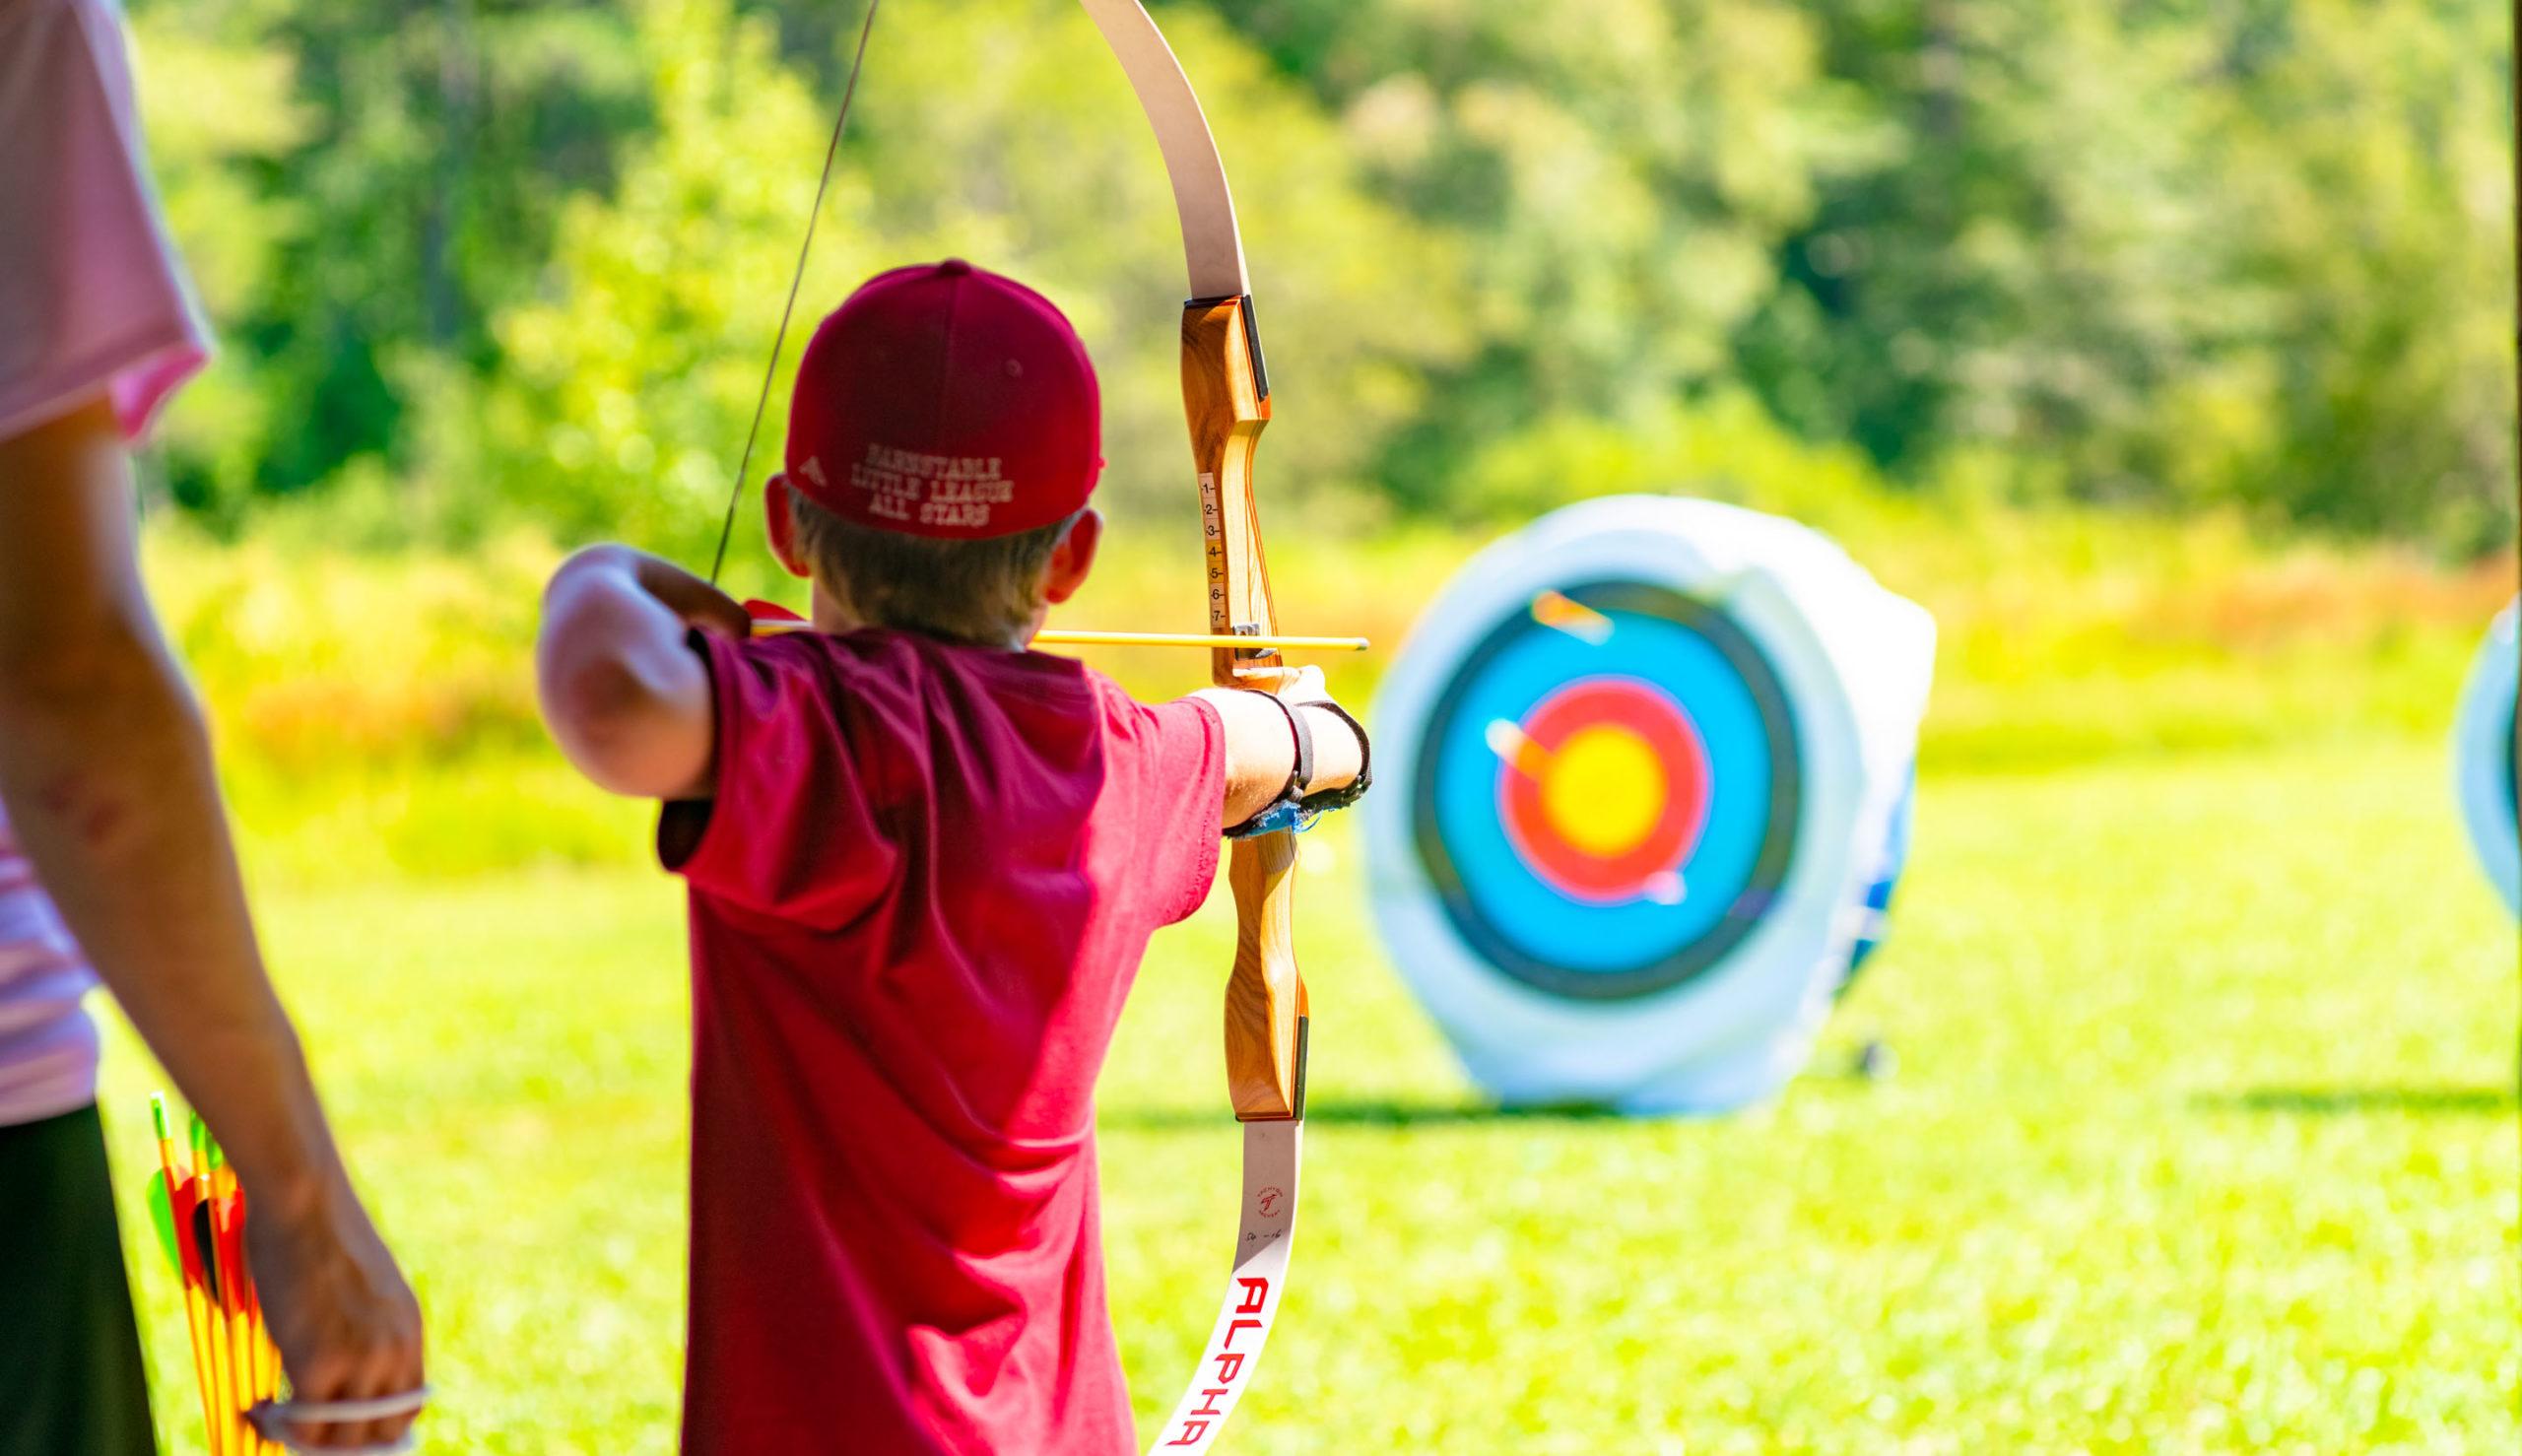 Camper at archery practice